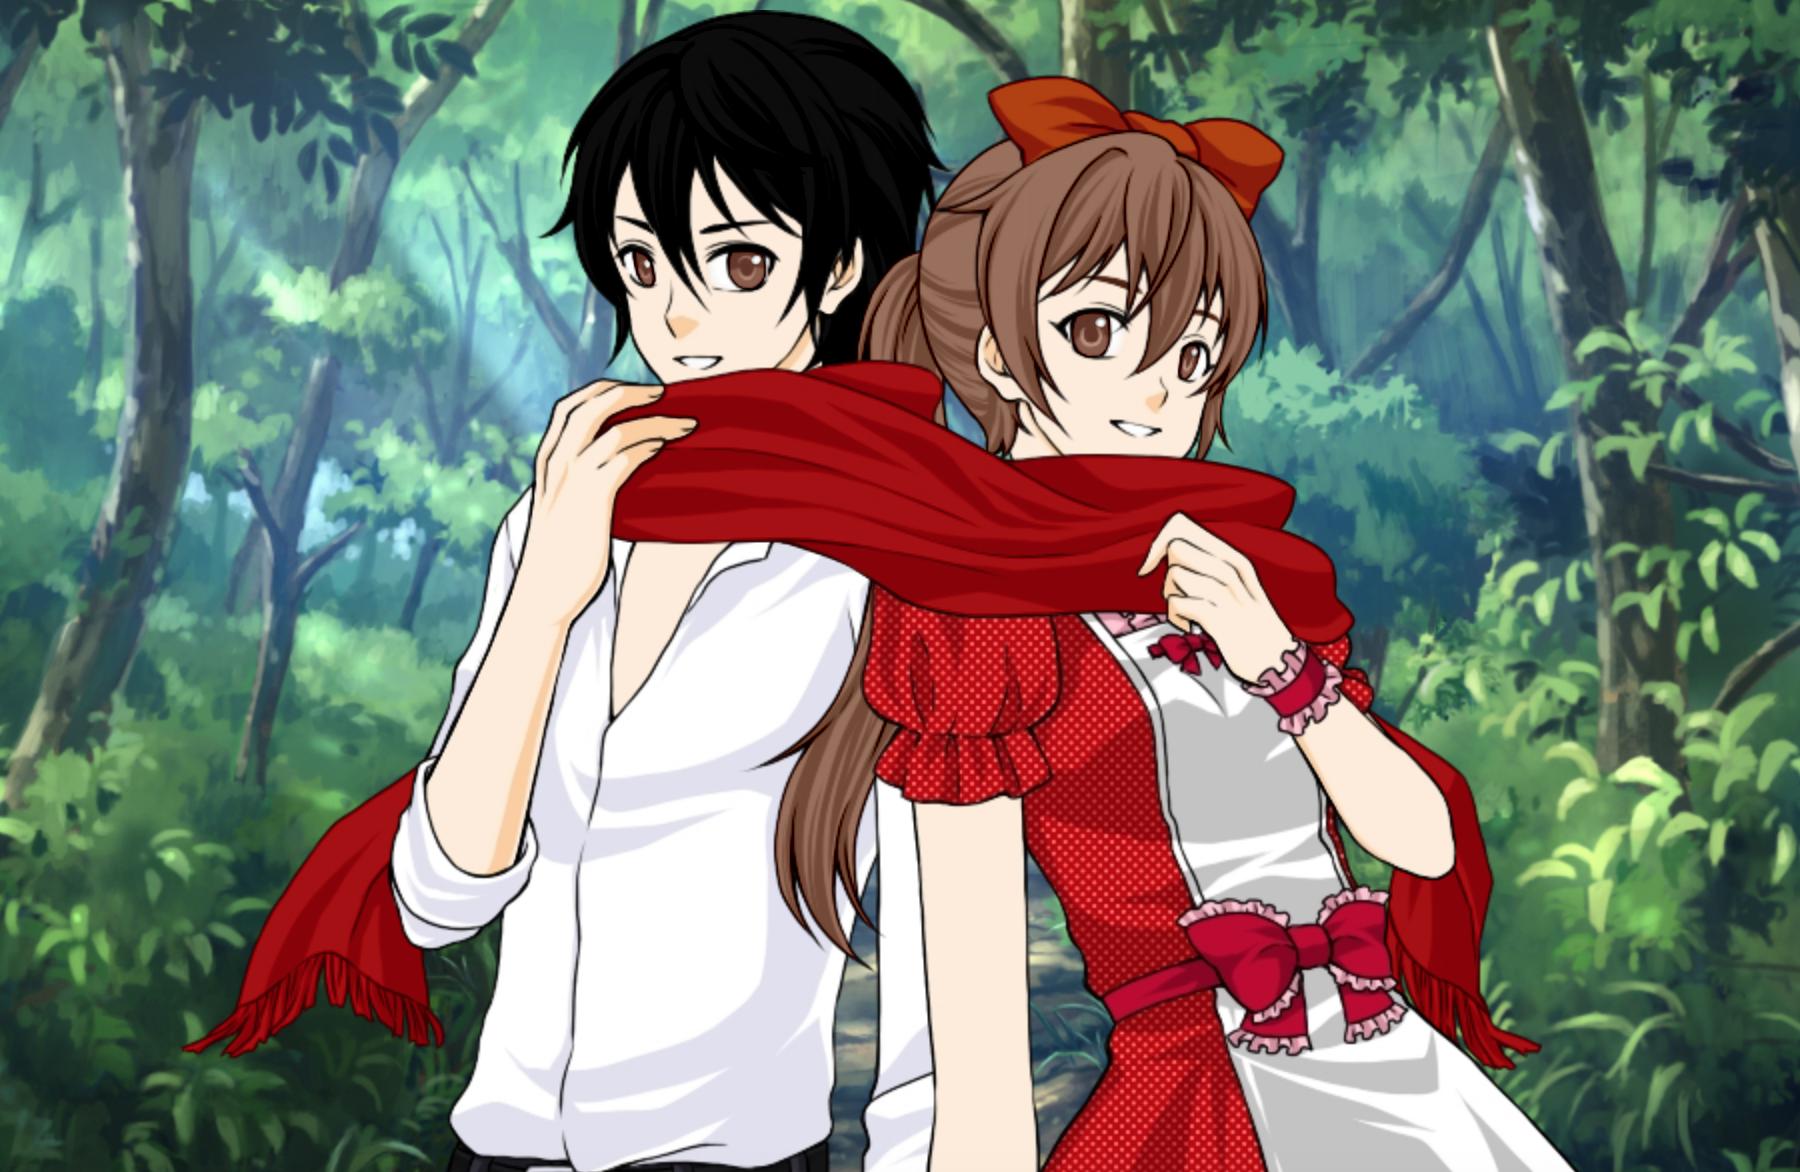 Arrietty and Shawn (Sho) Studio ghibli, Anime, Miyazaki